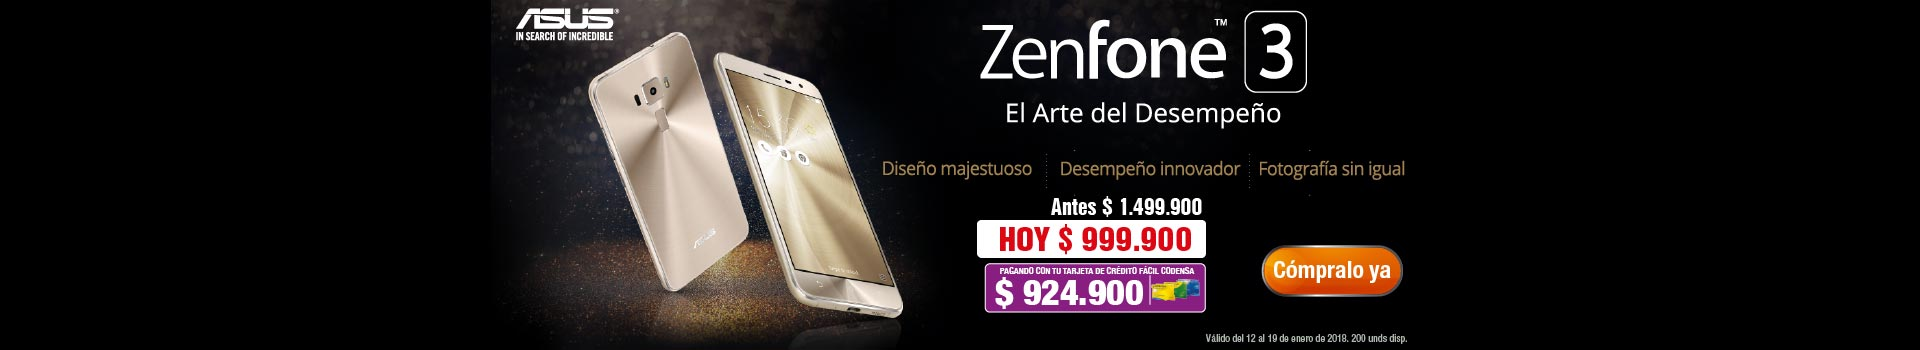 EXP AK KT ASUS -CAT-2-celulares-Zenfone3Dorado-prod-enero-13/16